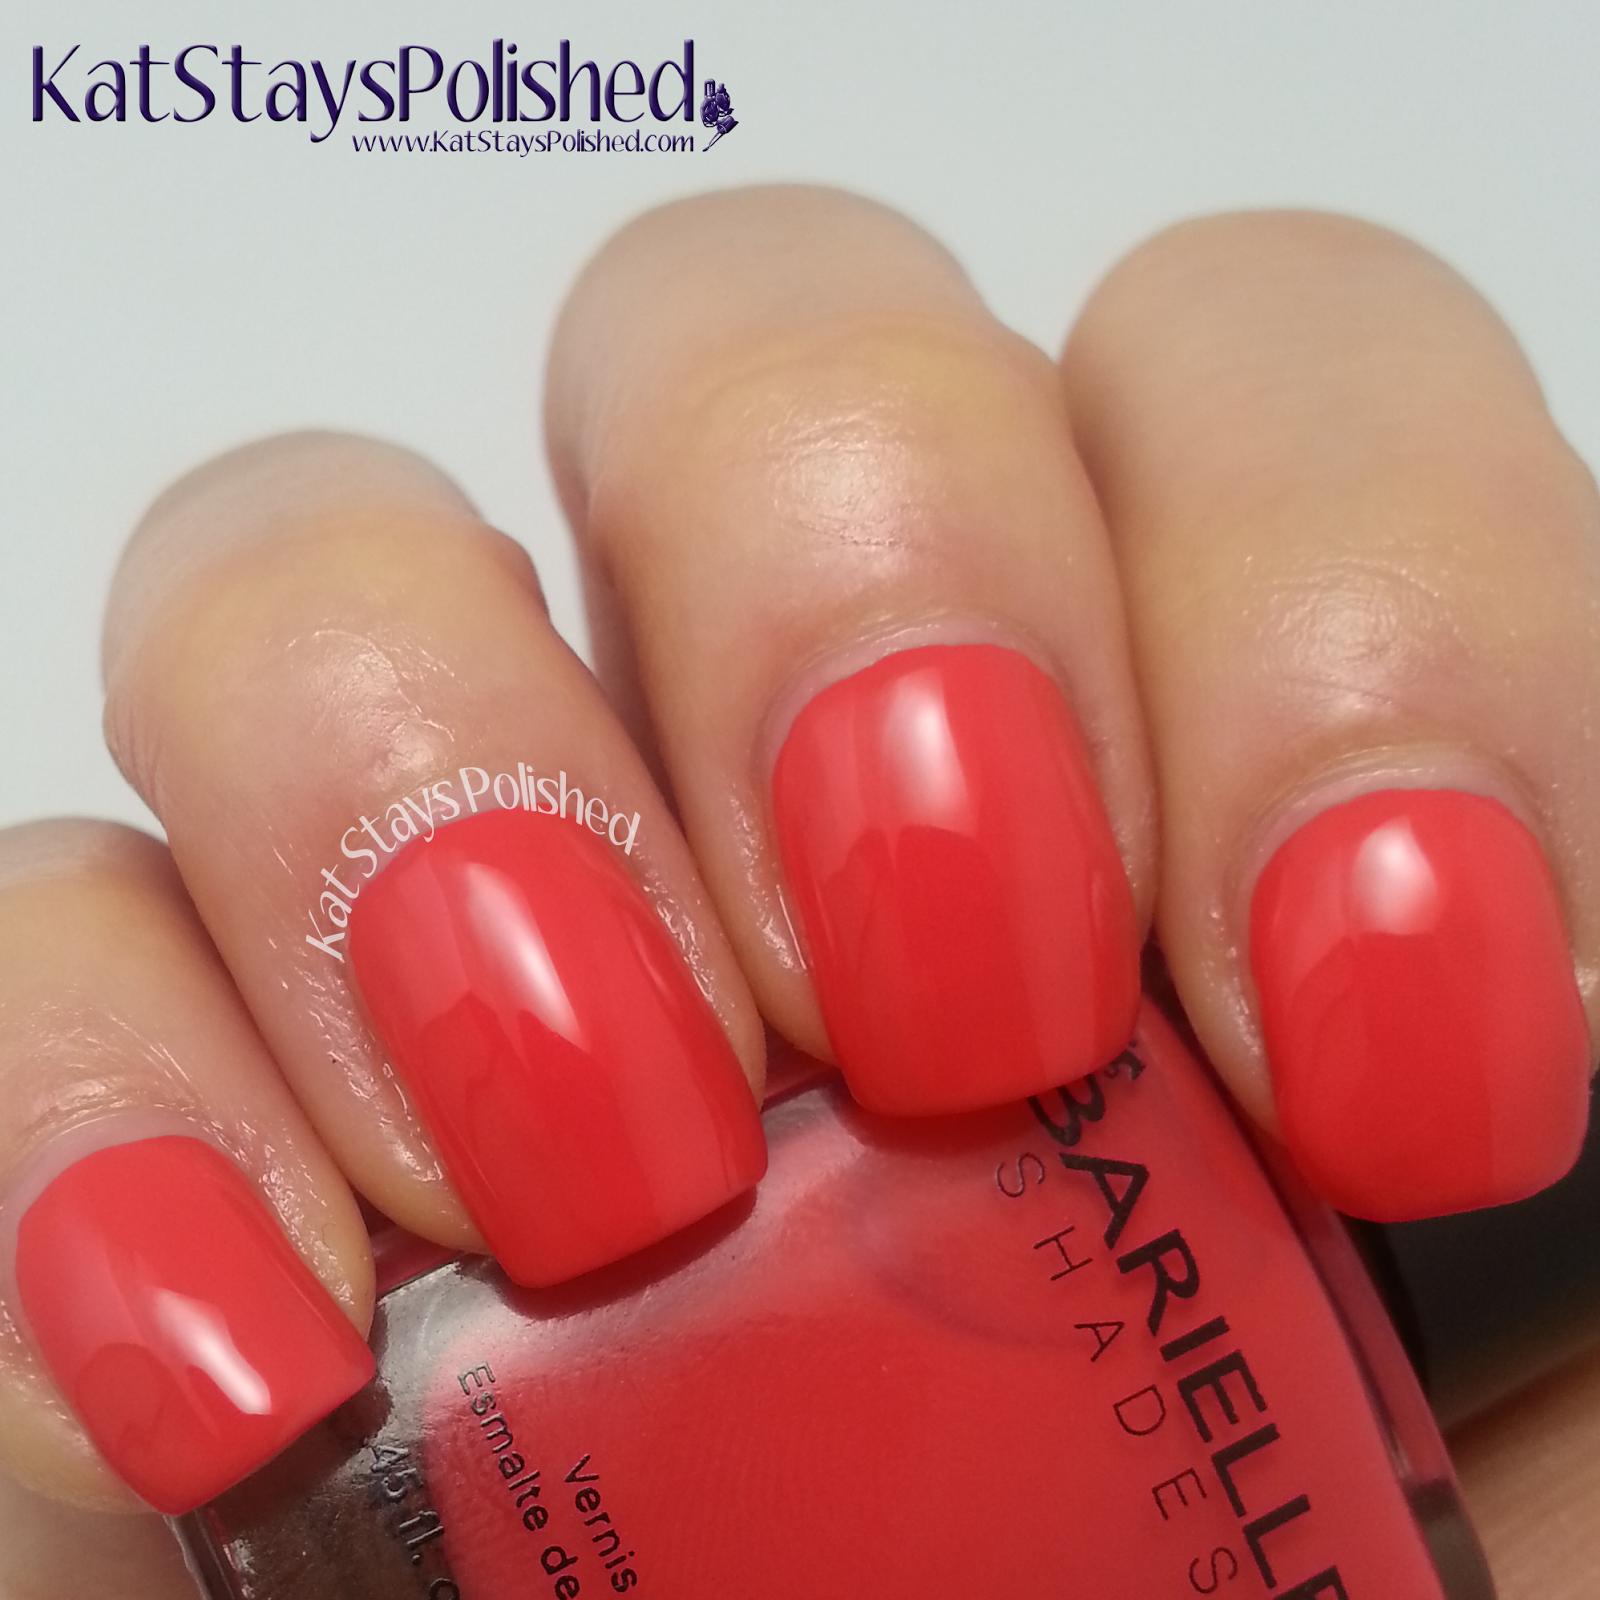 Barielle Spring Vibrants 2014 - Take Me Shopping | Kat Stays Polished